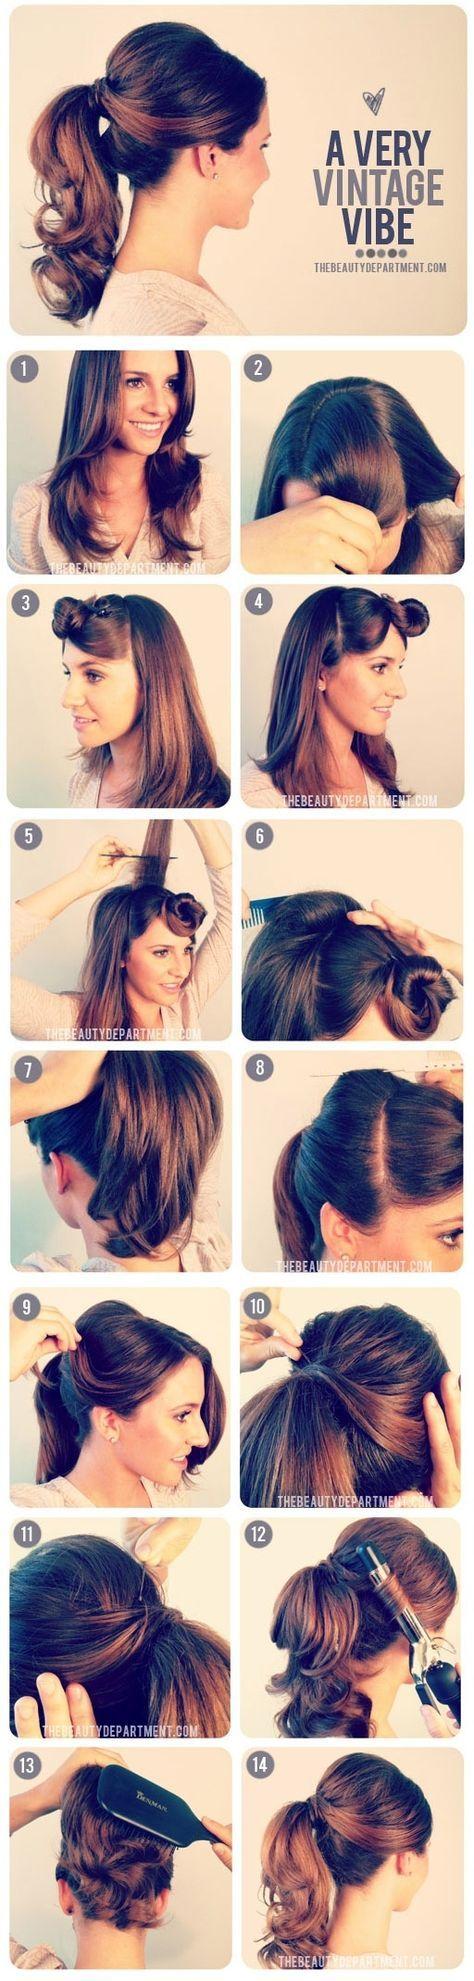 Peinado paso a paso